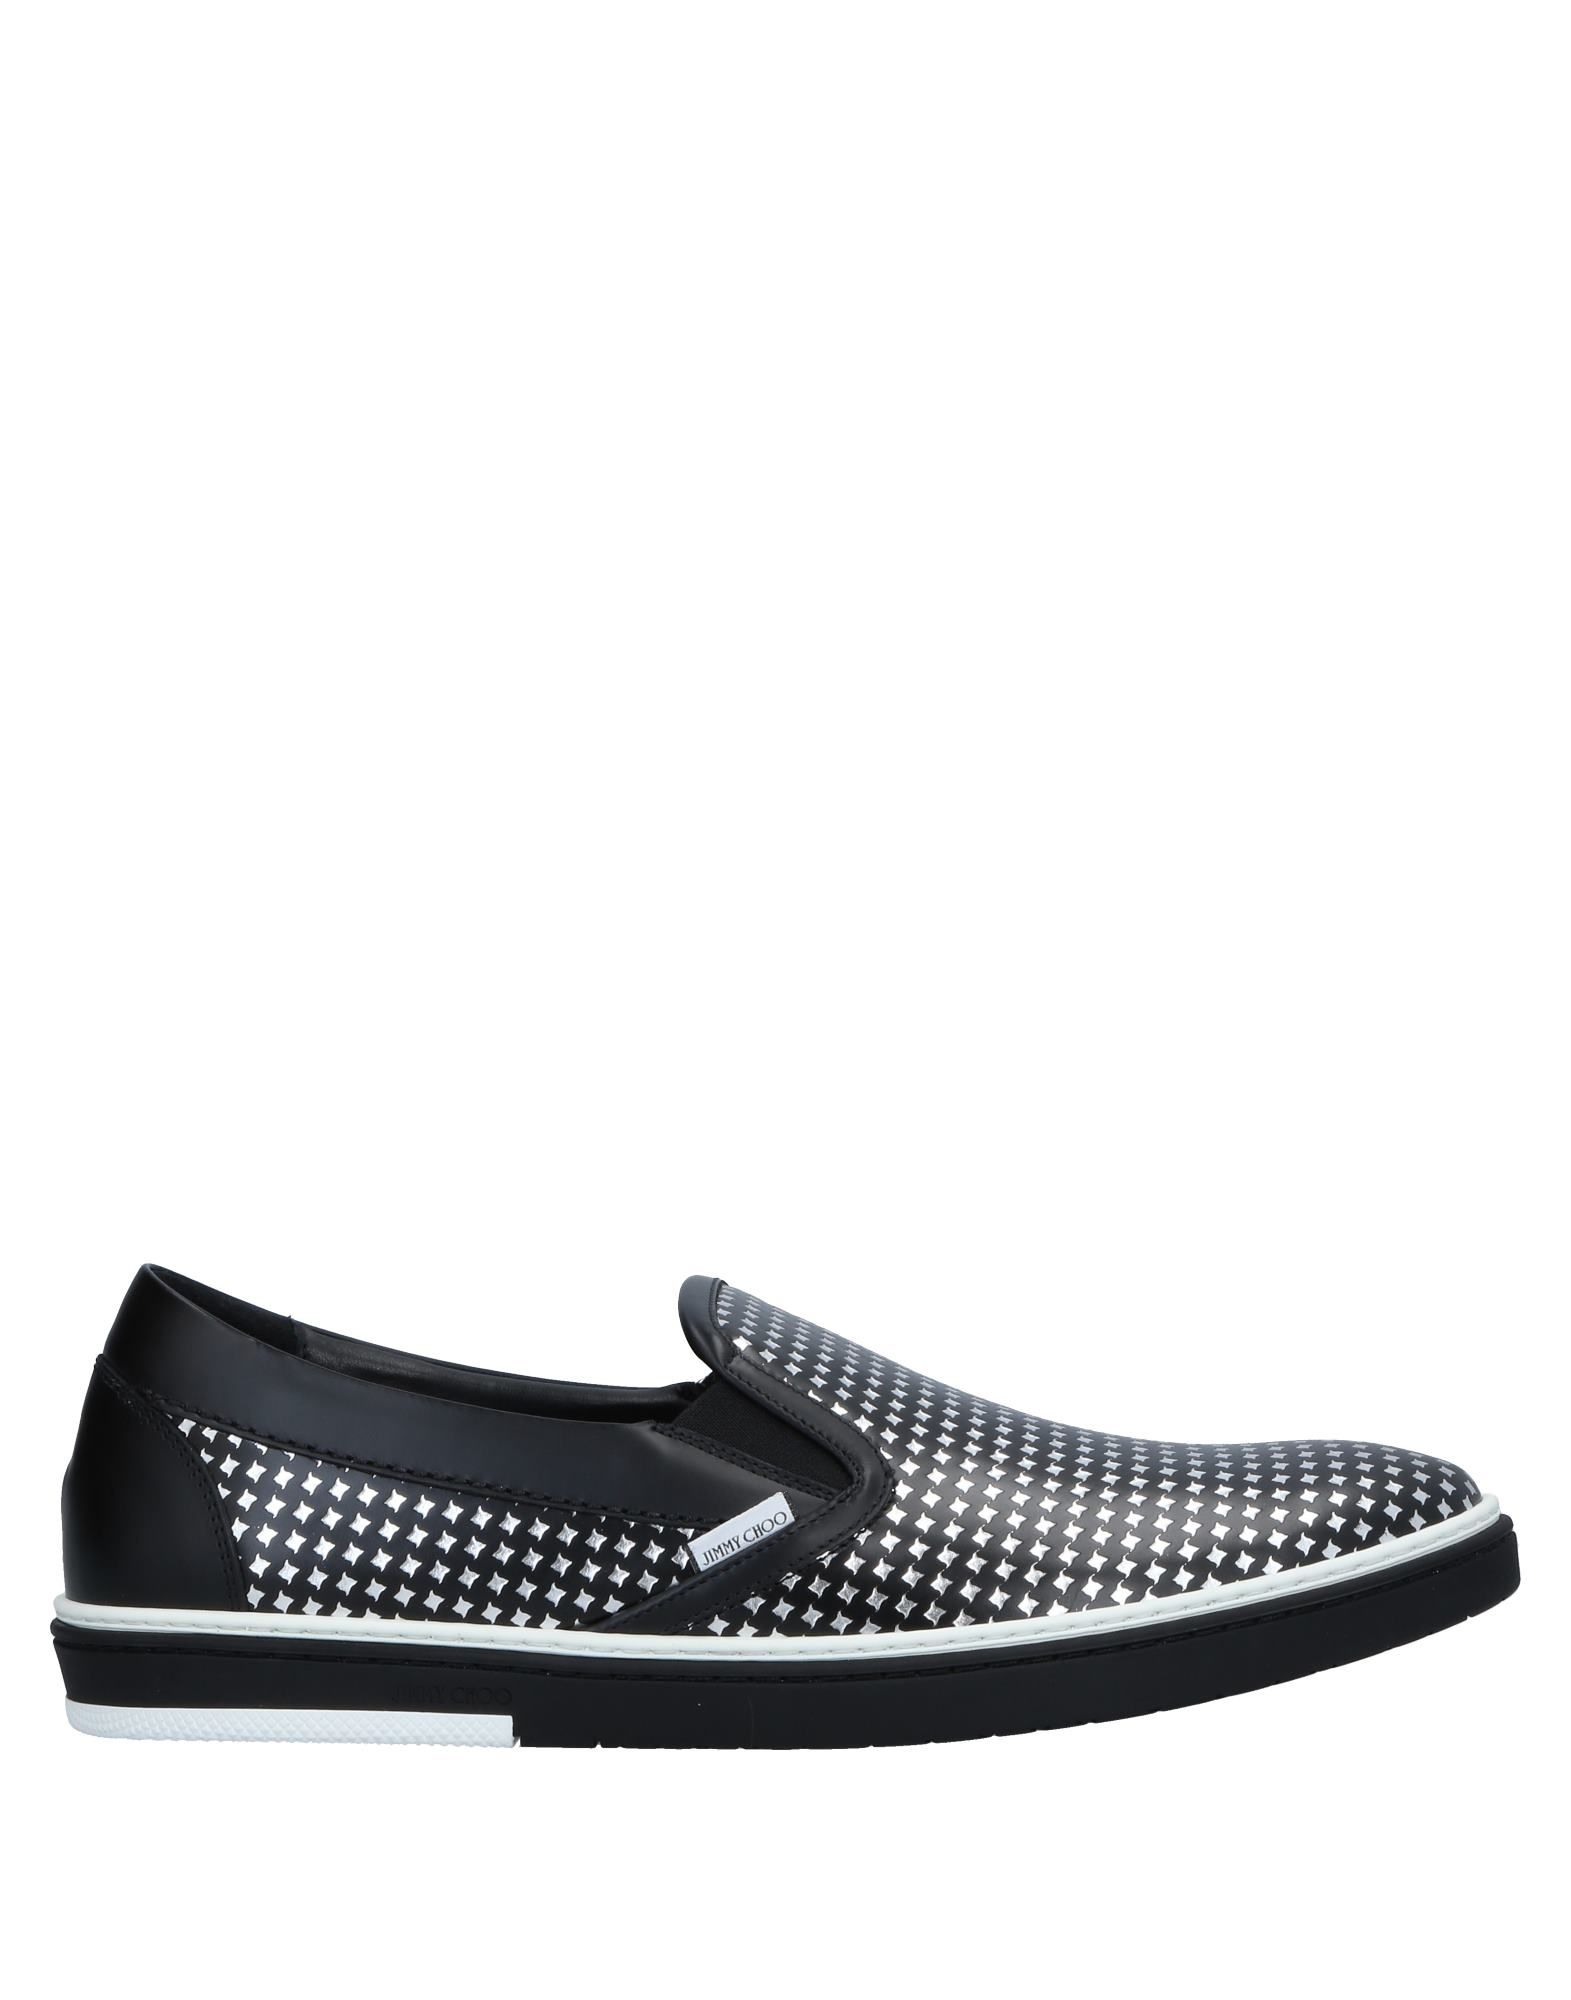 Jimmy Choo Sneakers Herren  11523097UN Gute Qualität beliebte Schuhe